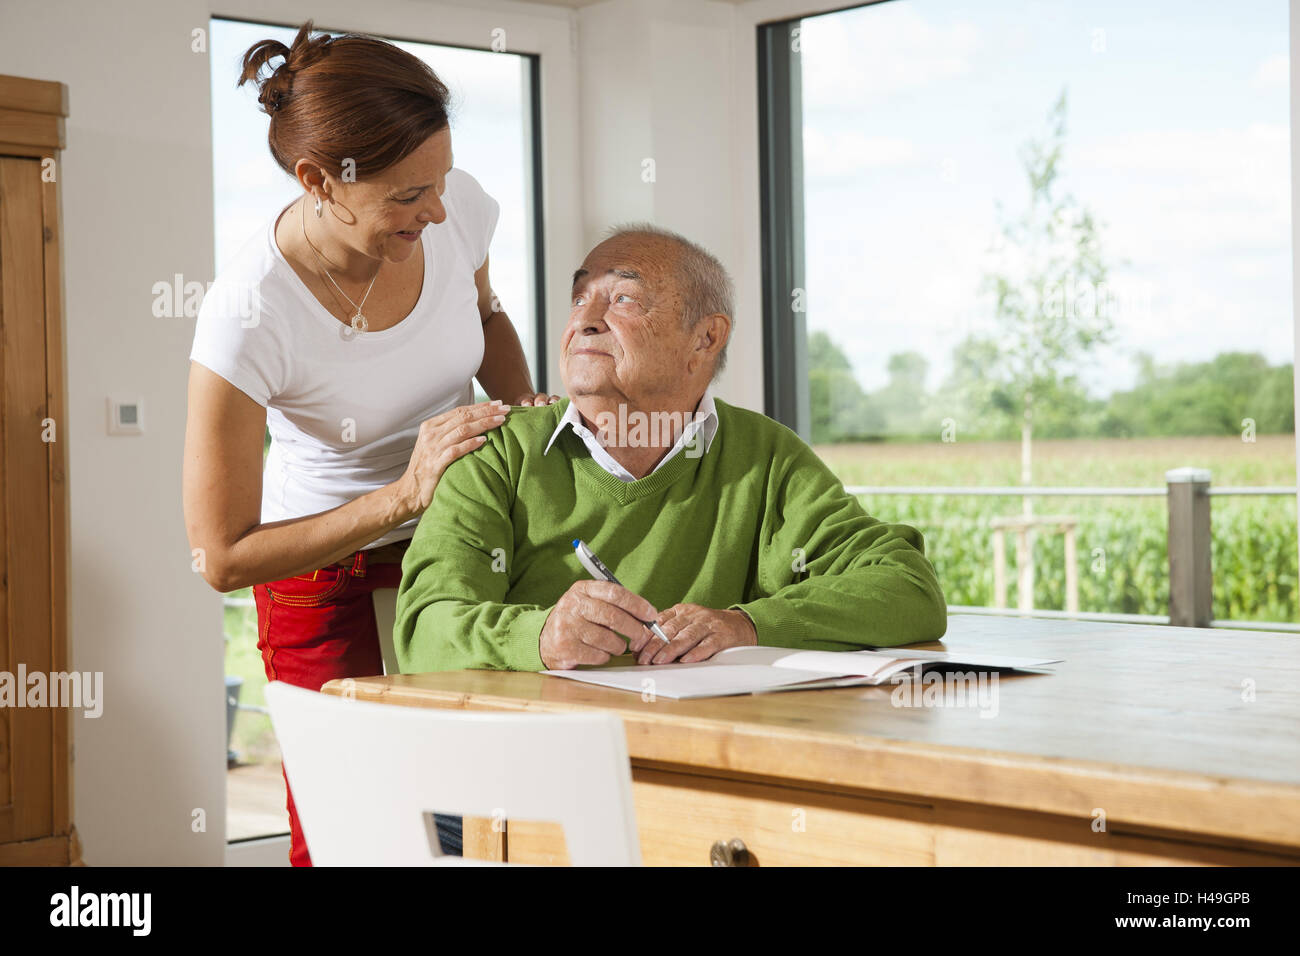 Senior man looks after advance decision, - Stock Image